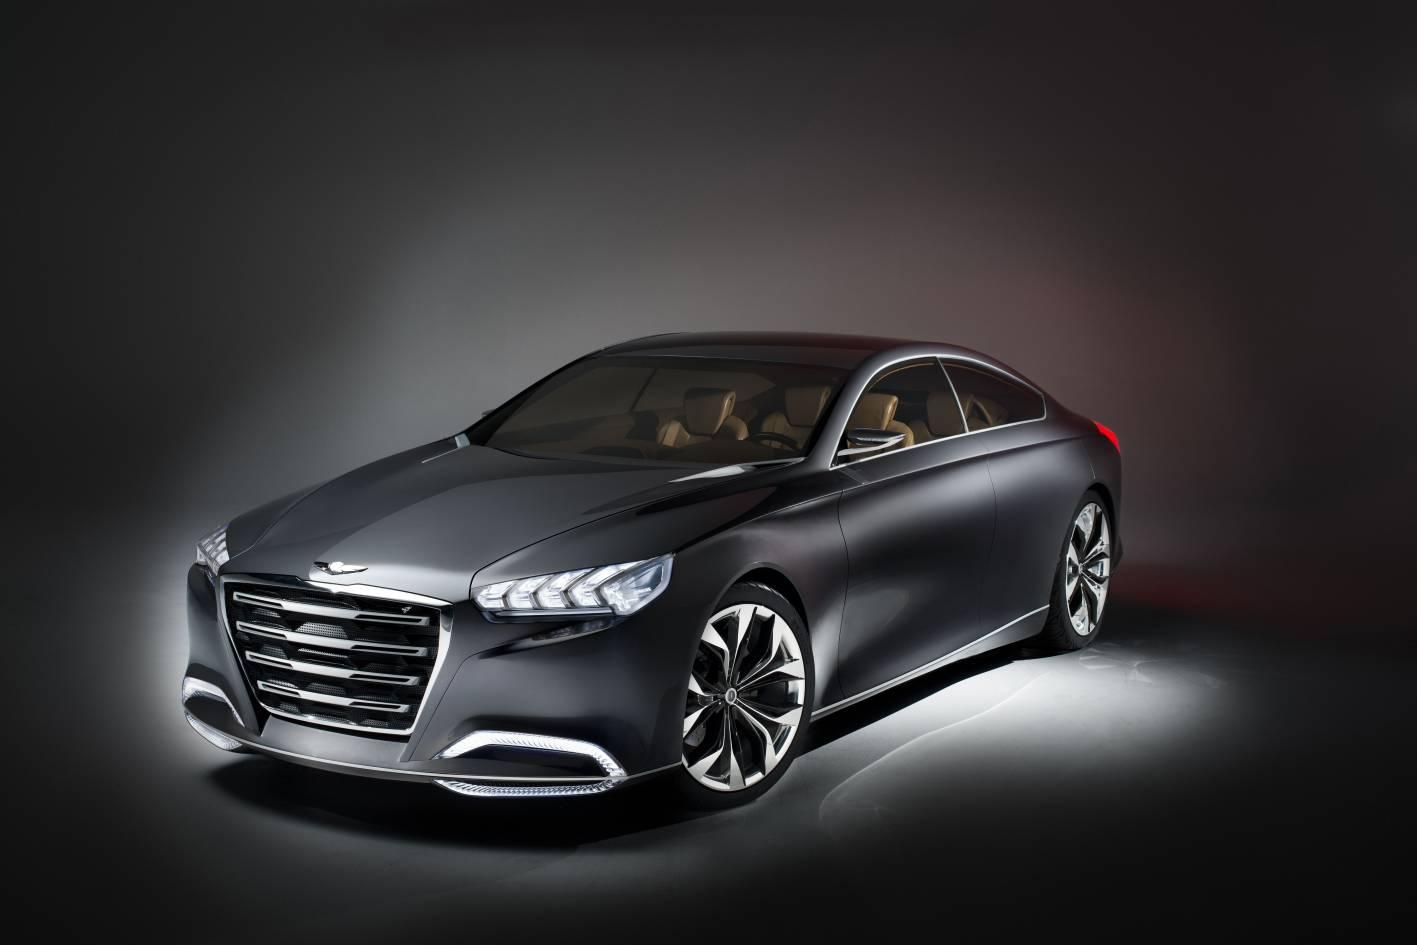 Hyundai HCD 14 Genesis Concept Hints At Future Design